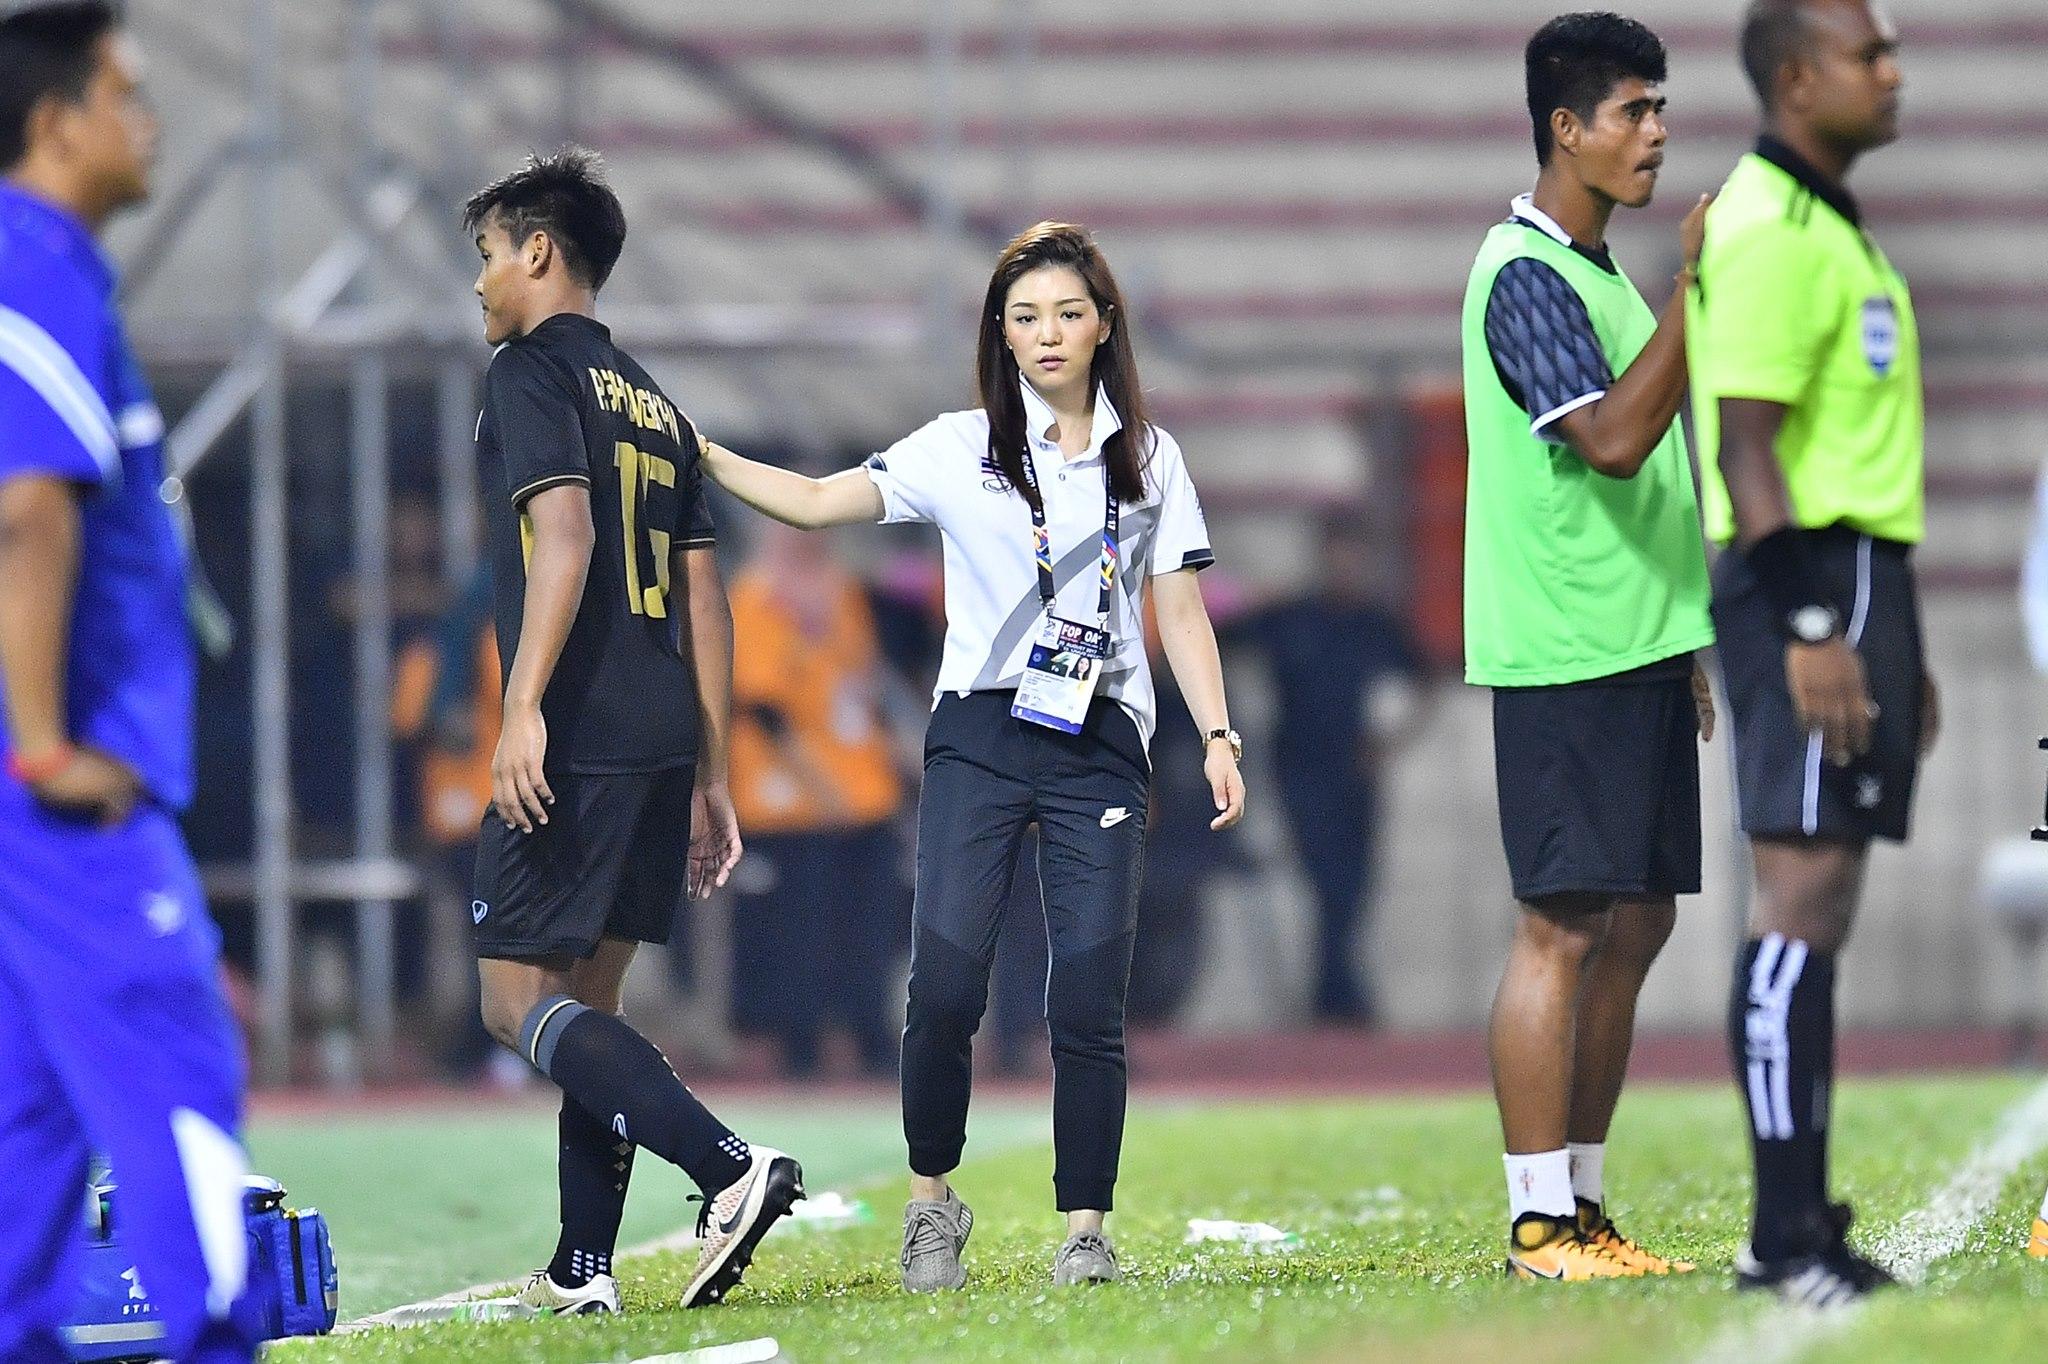 Watanya Wongopasi, Thailand U22, SEA Games, 20082017